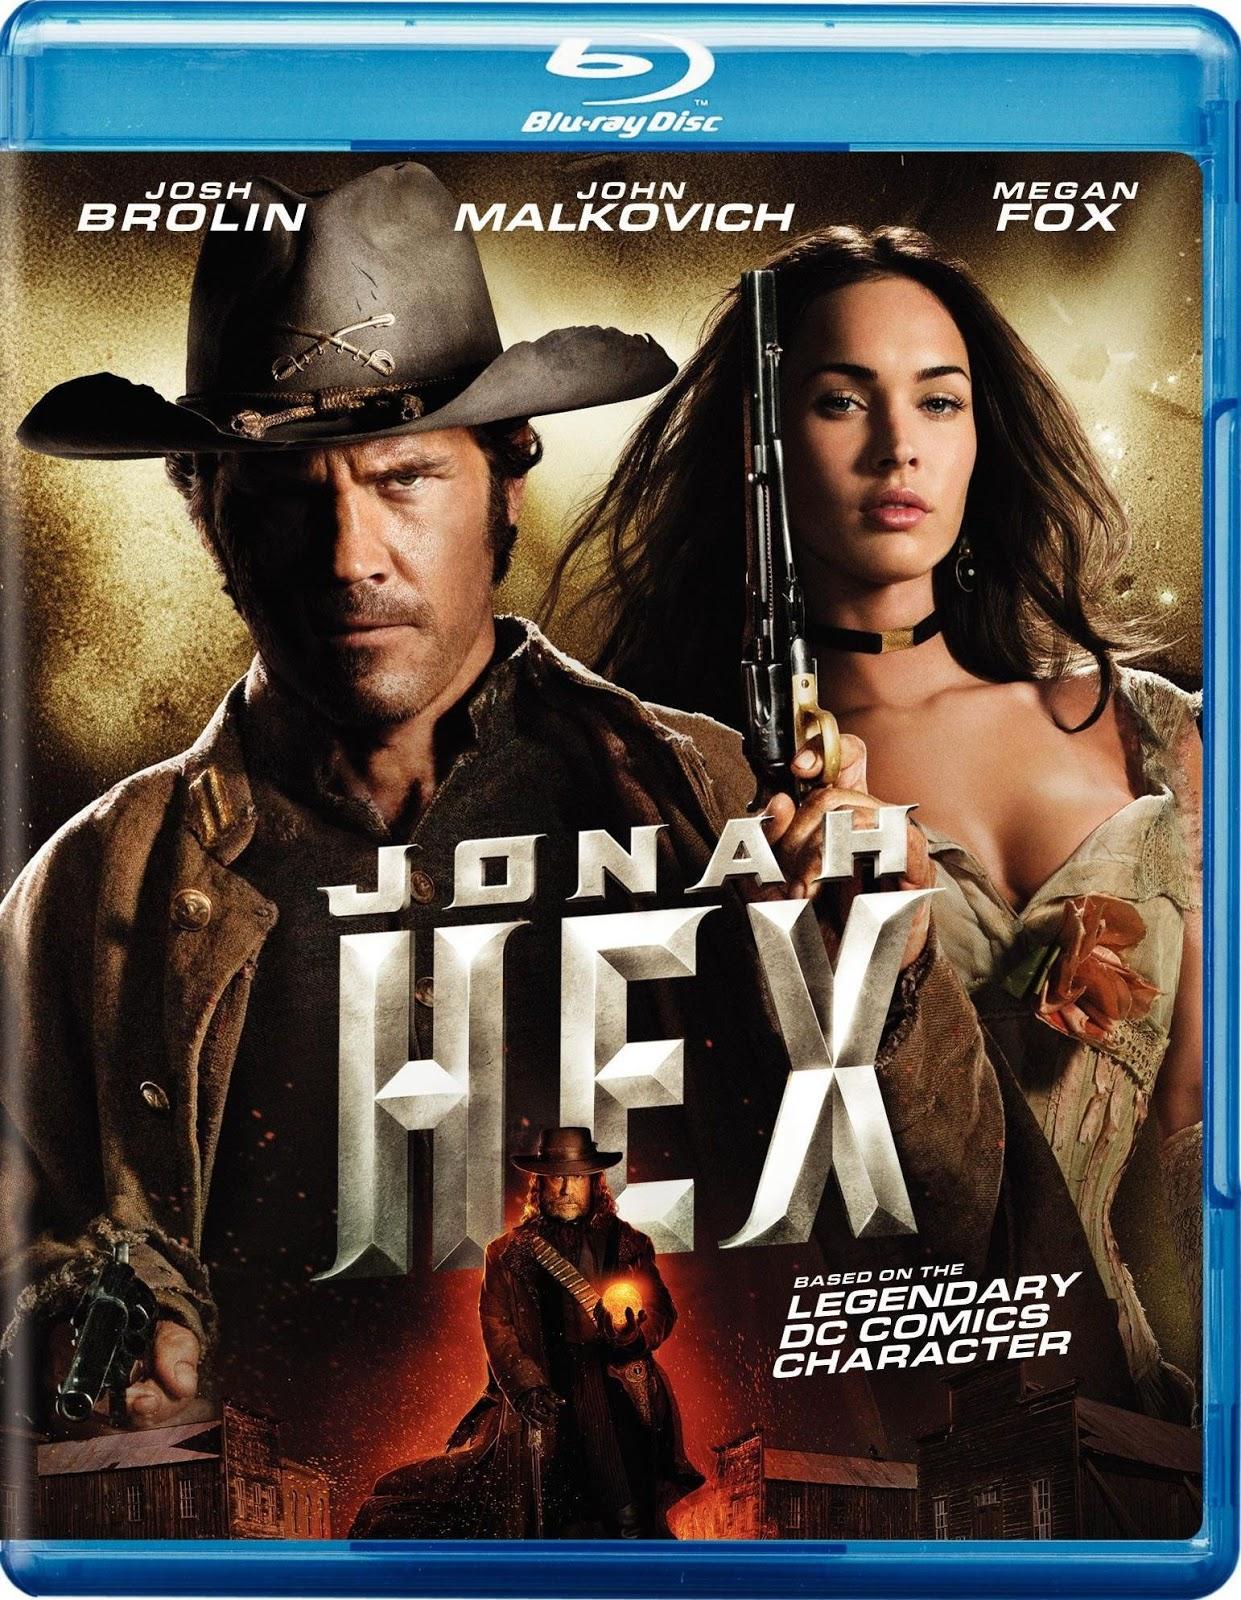 Download Jonah Hex 2010 x264 720p Esub BluRay 6 0 Dual Audio English Hindi Torrent